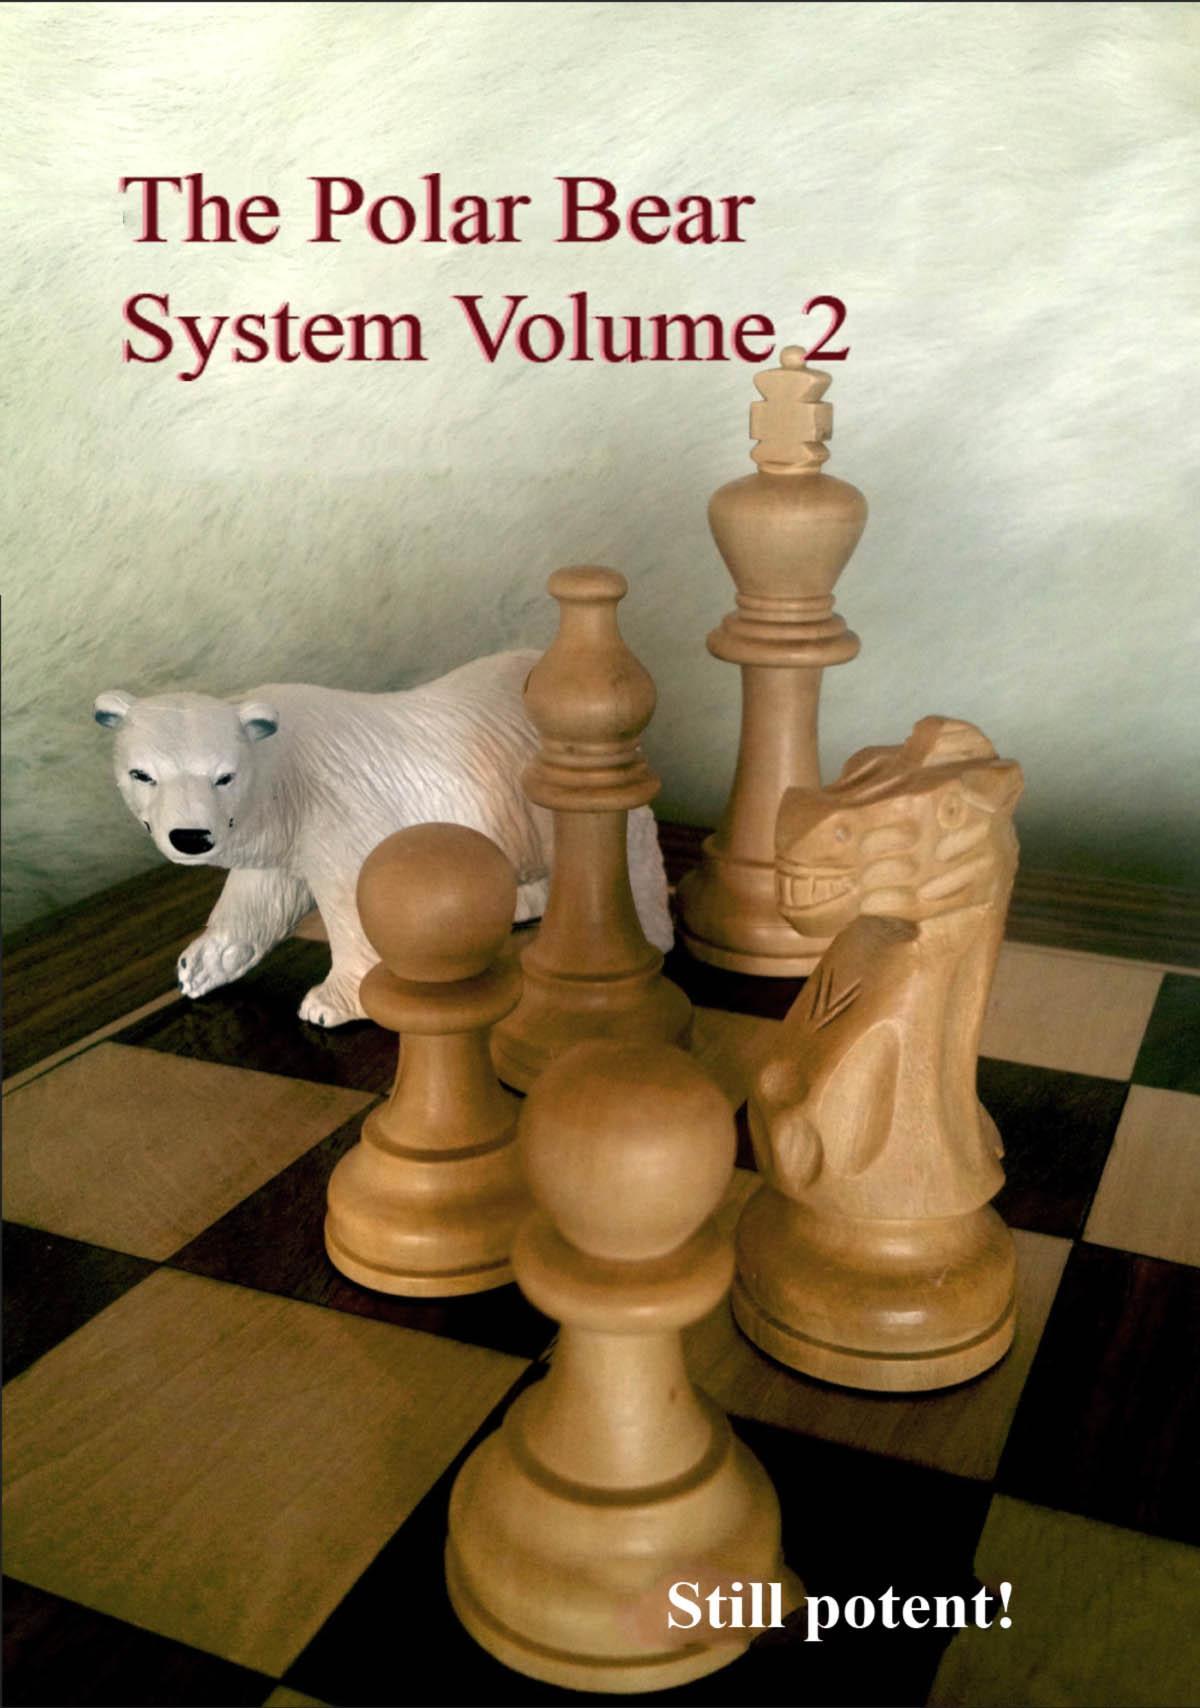 The Polar Bear System: Volume 2